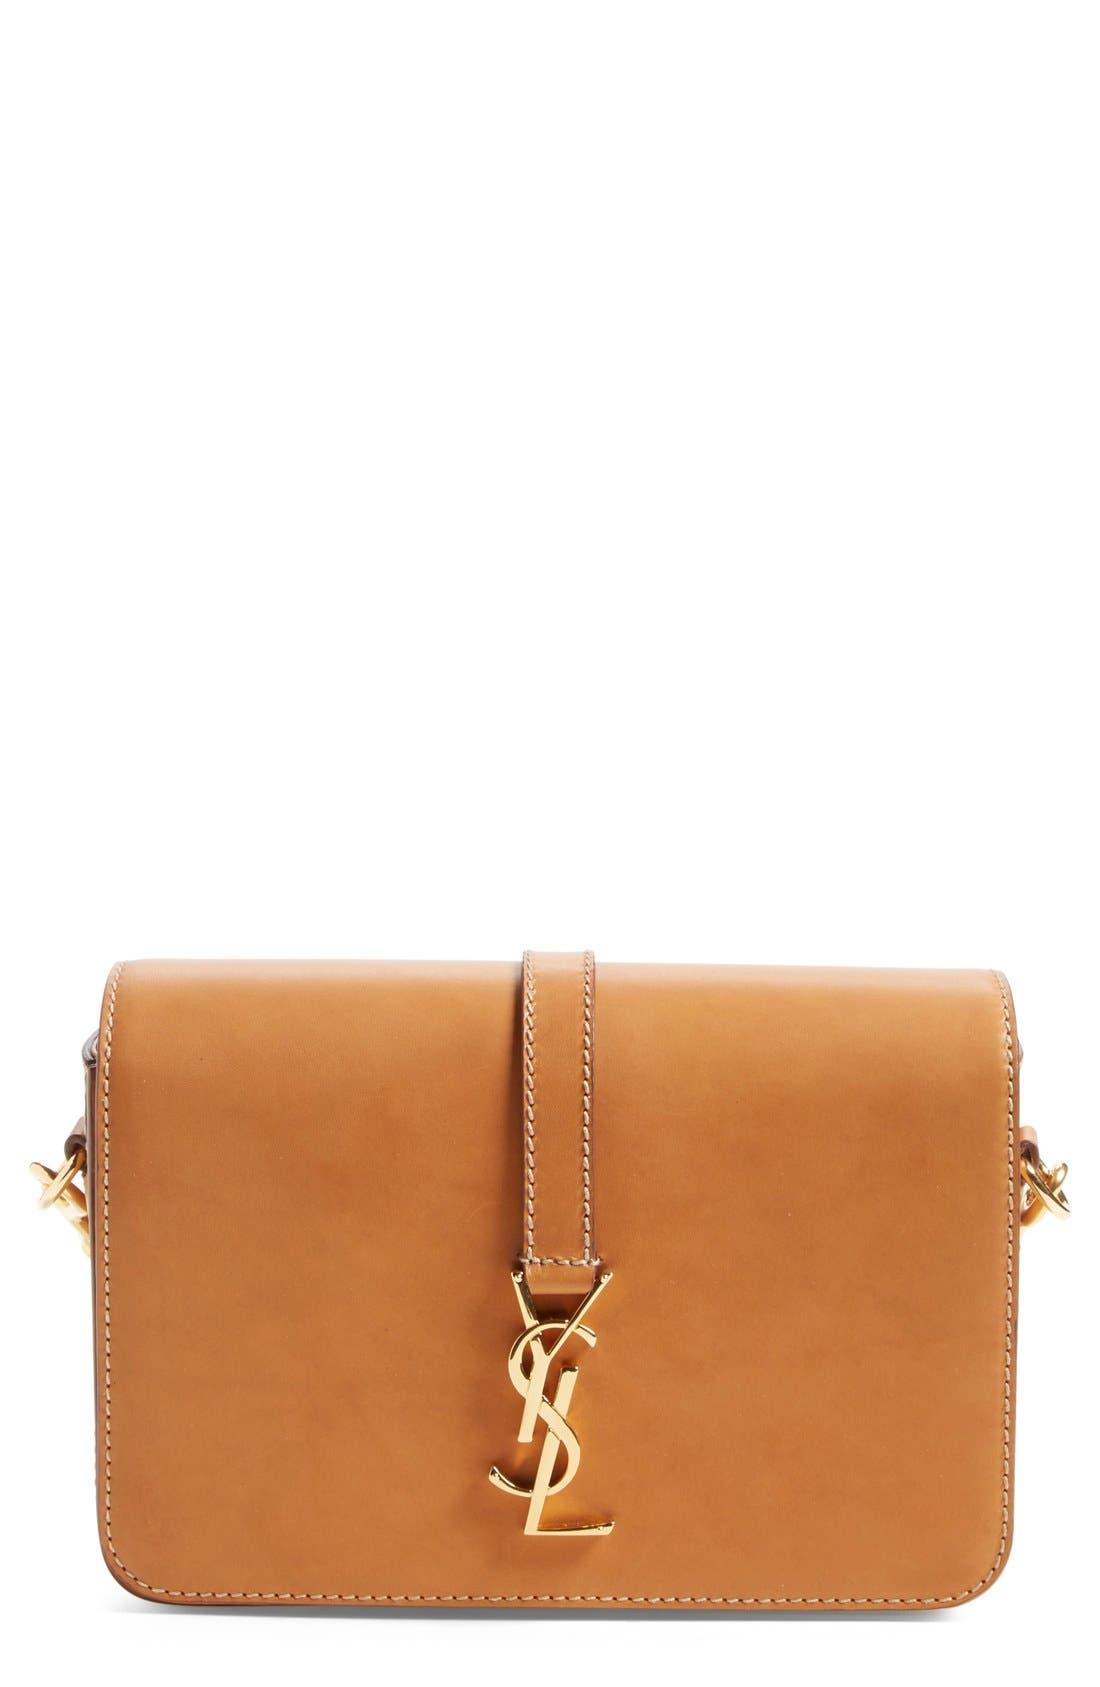 Alternate Image 1 Selected - Saint Laurent 'Medium Monogram' Leather Crossbody Bag